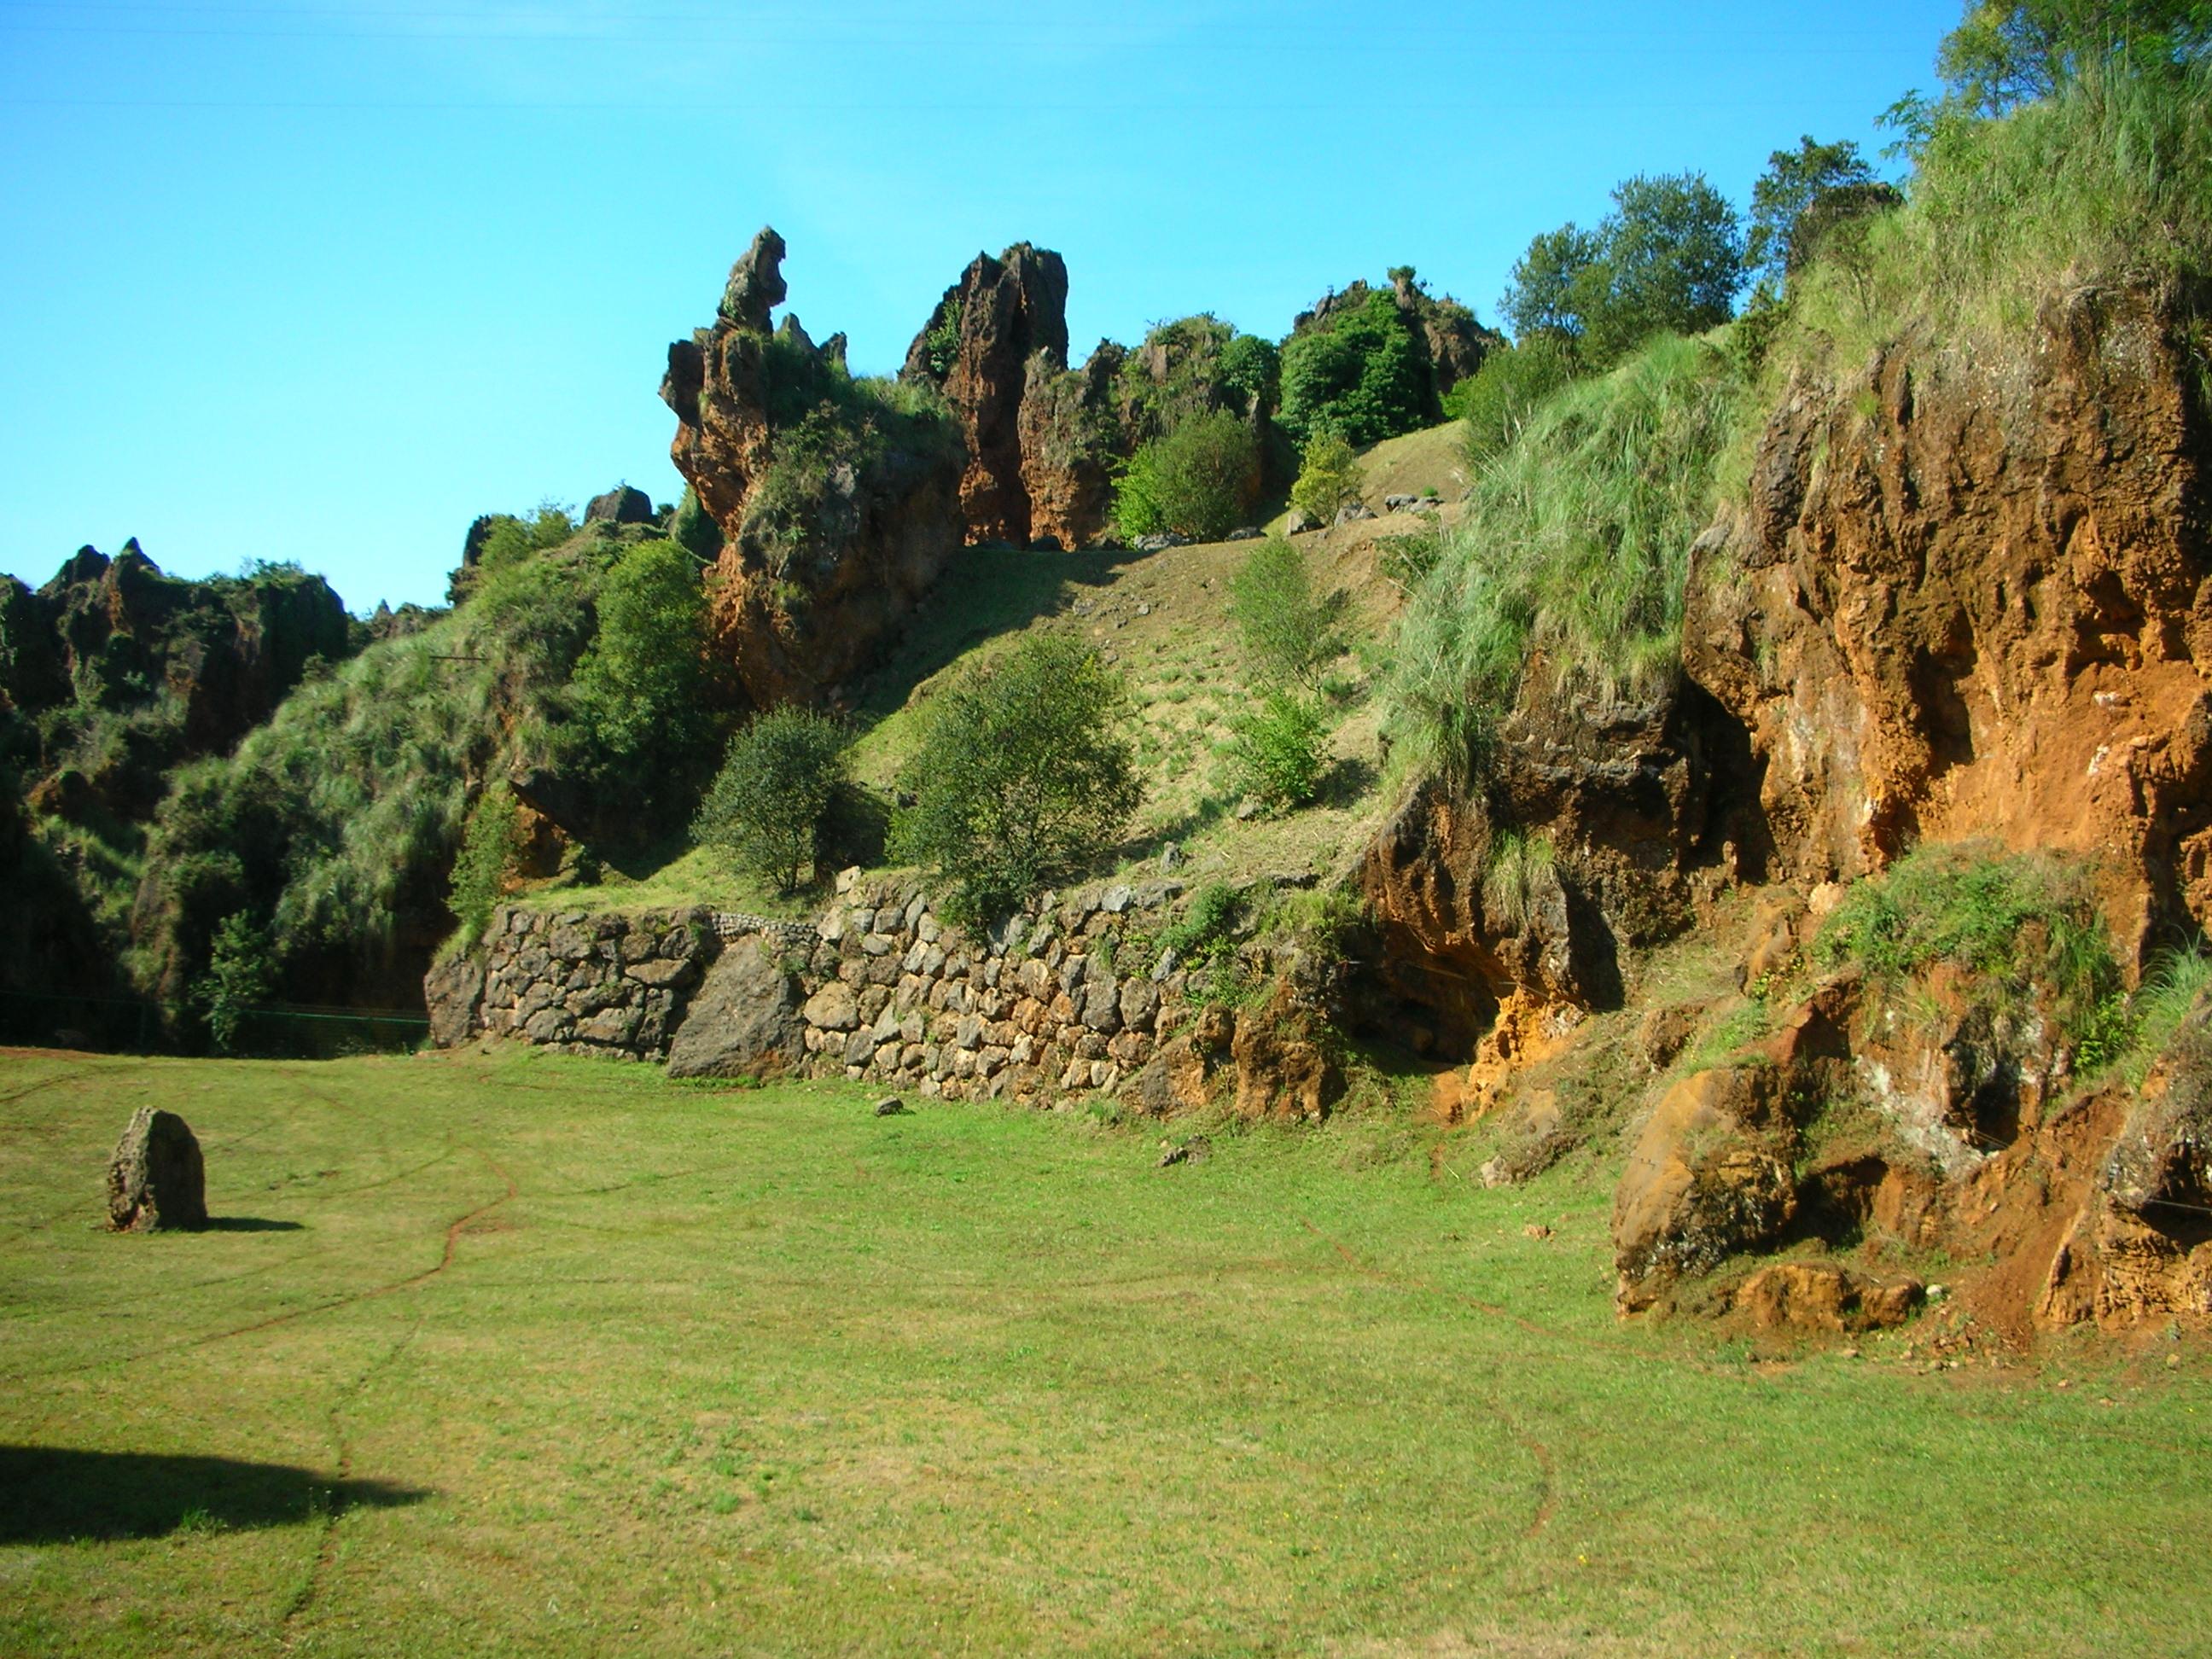 File:Spain.Cantabria.Cabárceno.Parque.03.JPG - Wikimedia Commons